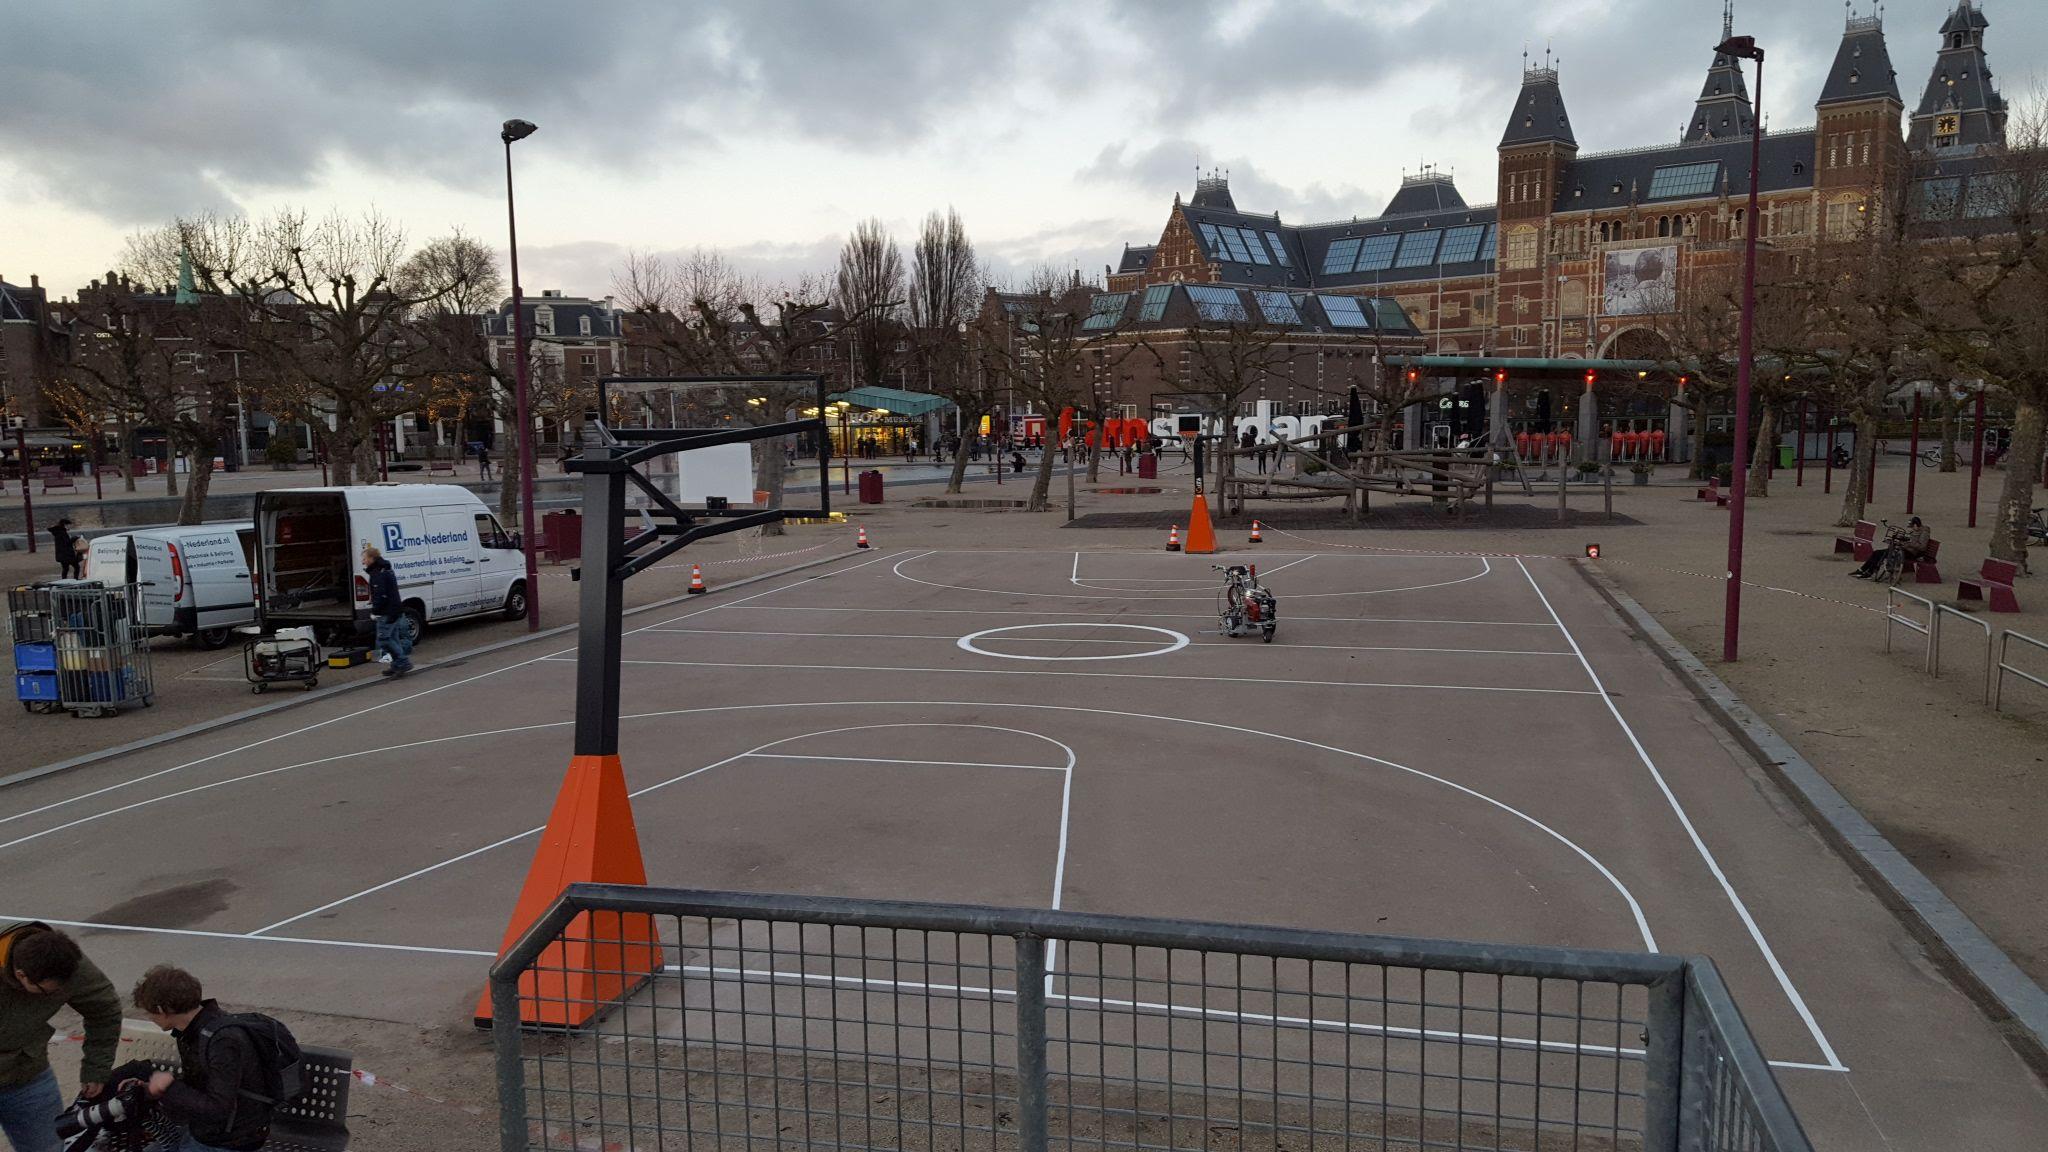 Belijning basketbalveld Museumplein Amsterdam